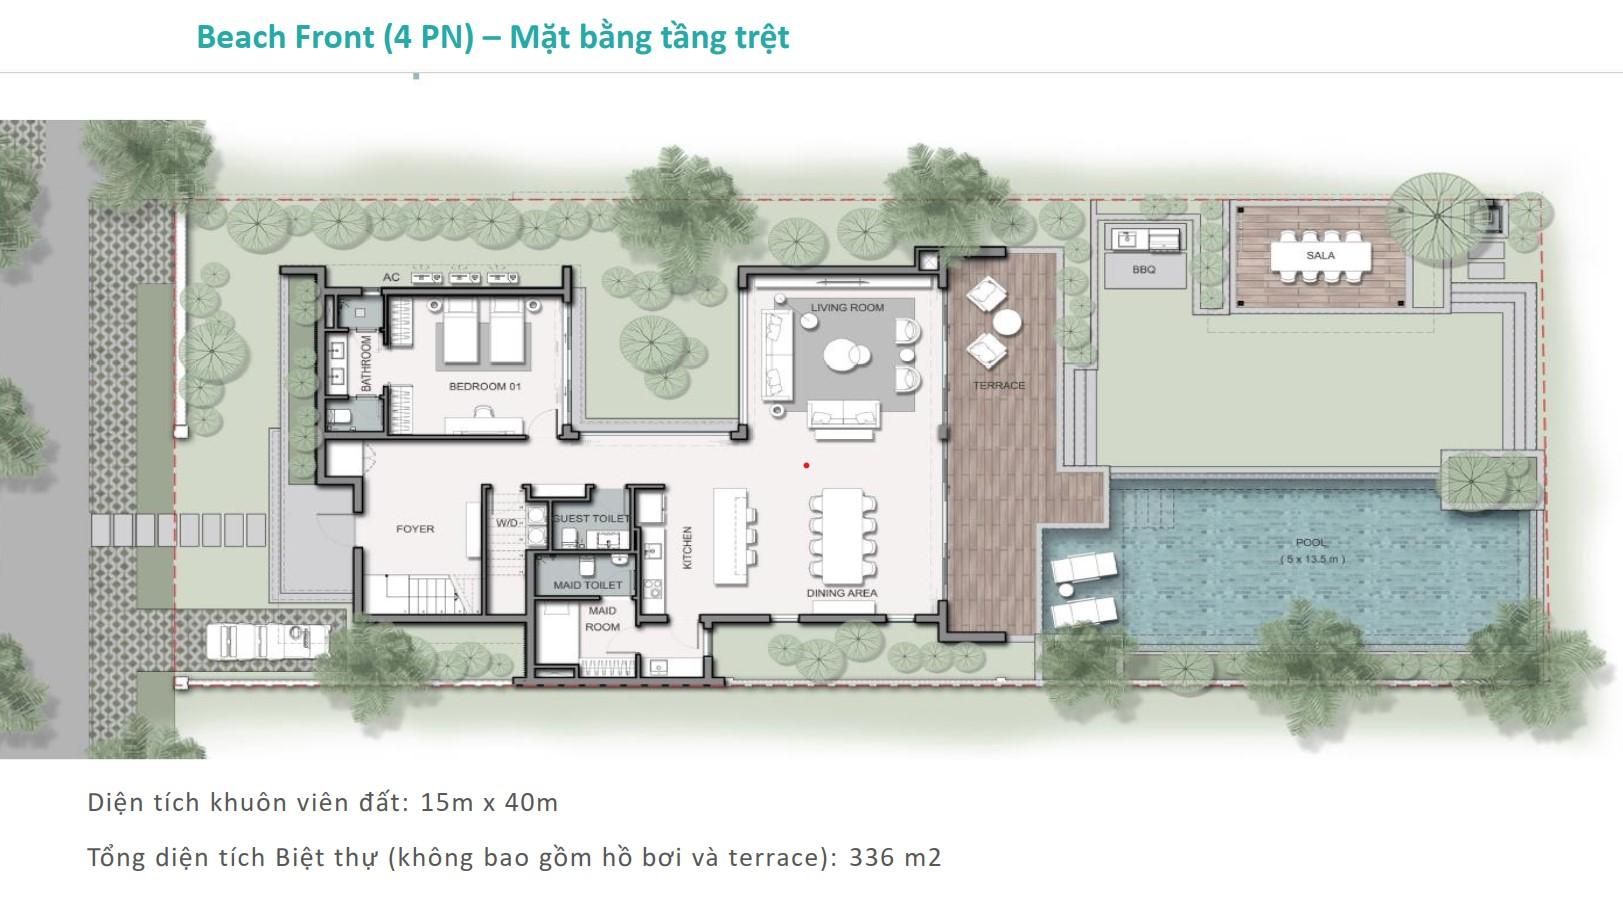 mat-bang-4pn-du-an-maia-resort-quy-nhon